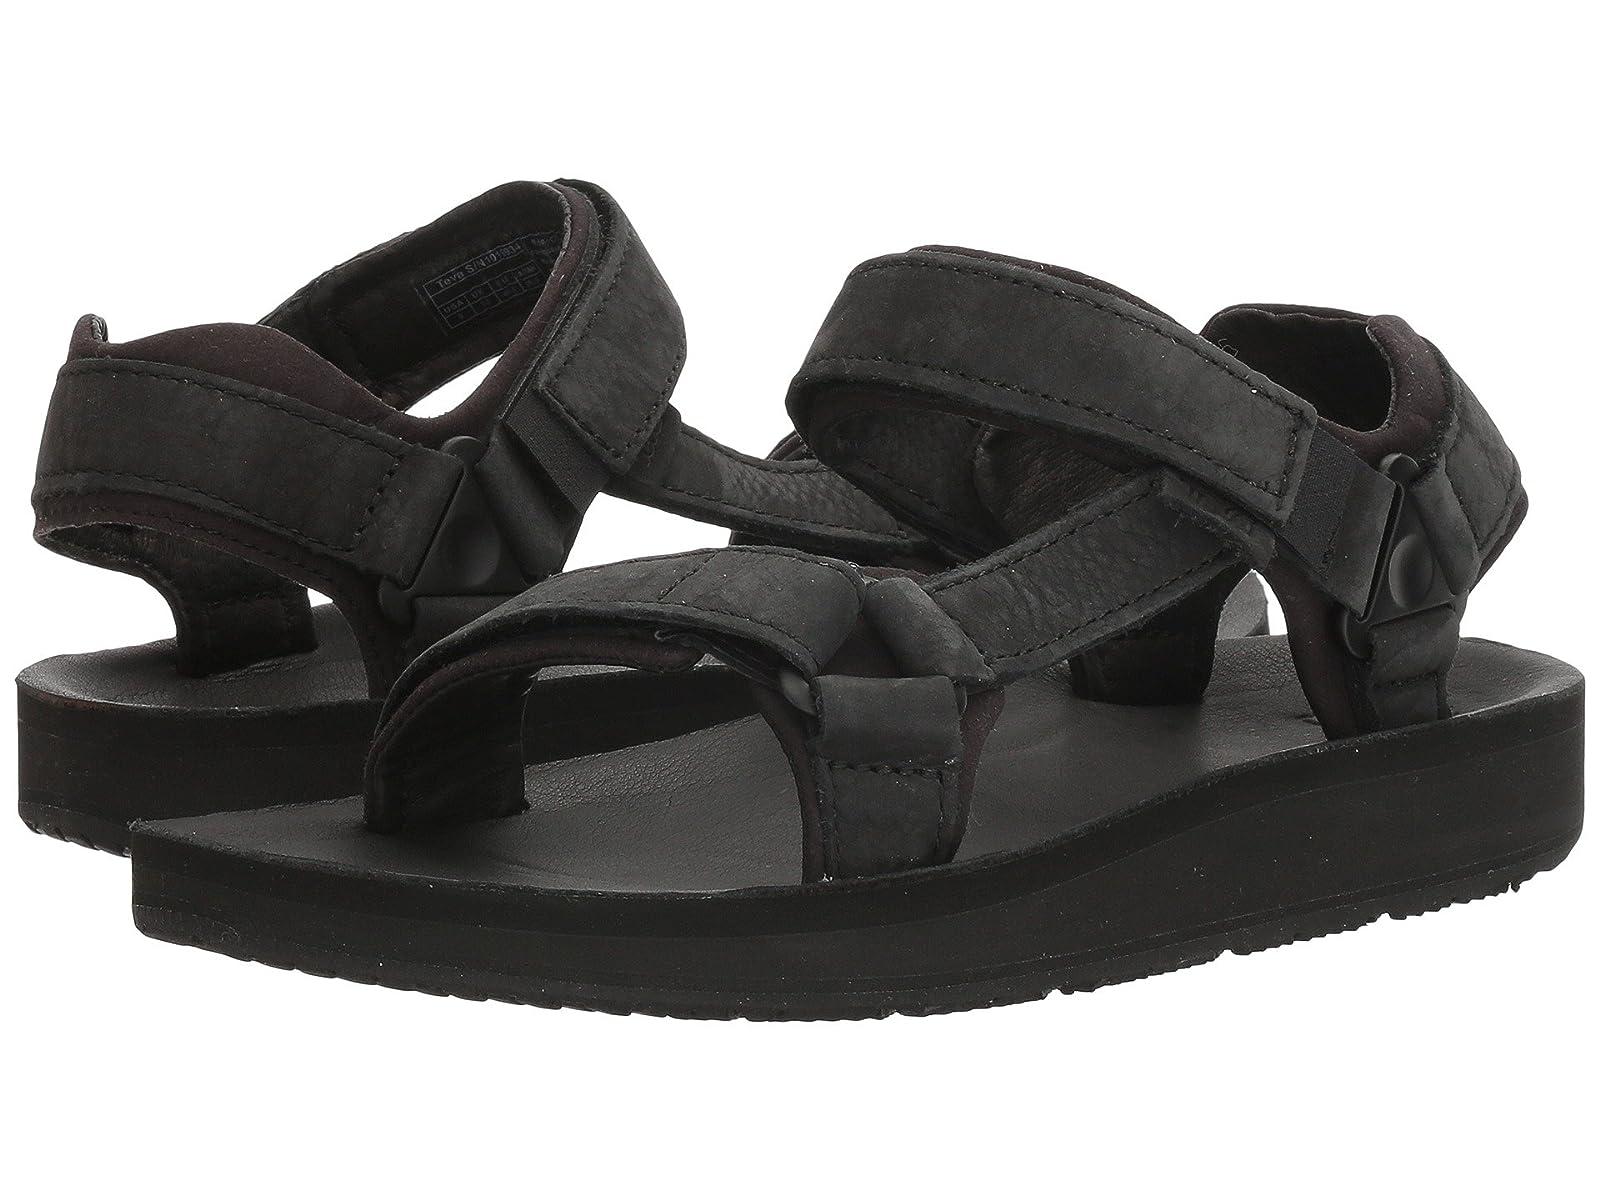 Teva Original Universal Premier - LeatherAtmospheric grades have affordable shoes